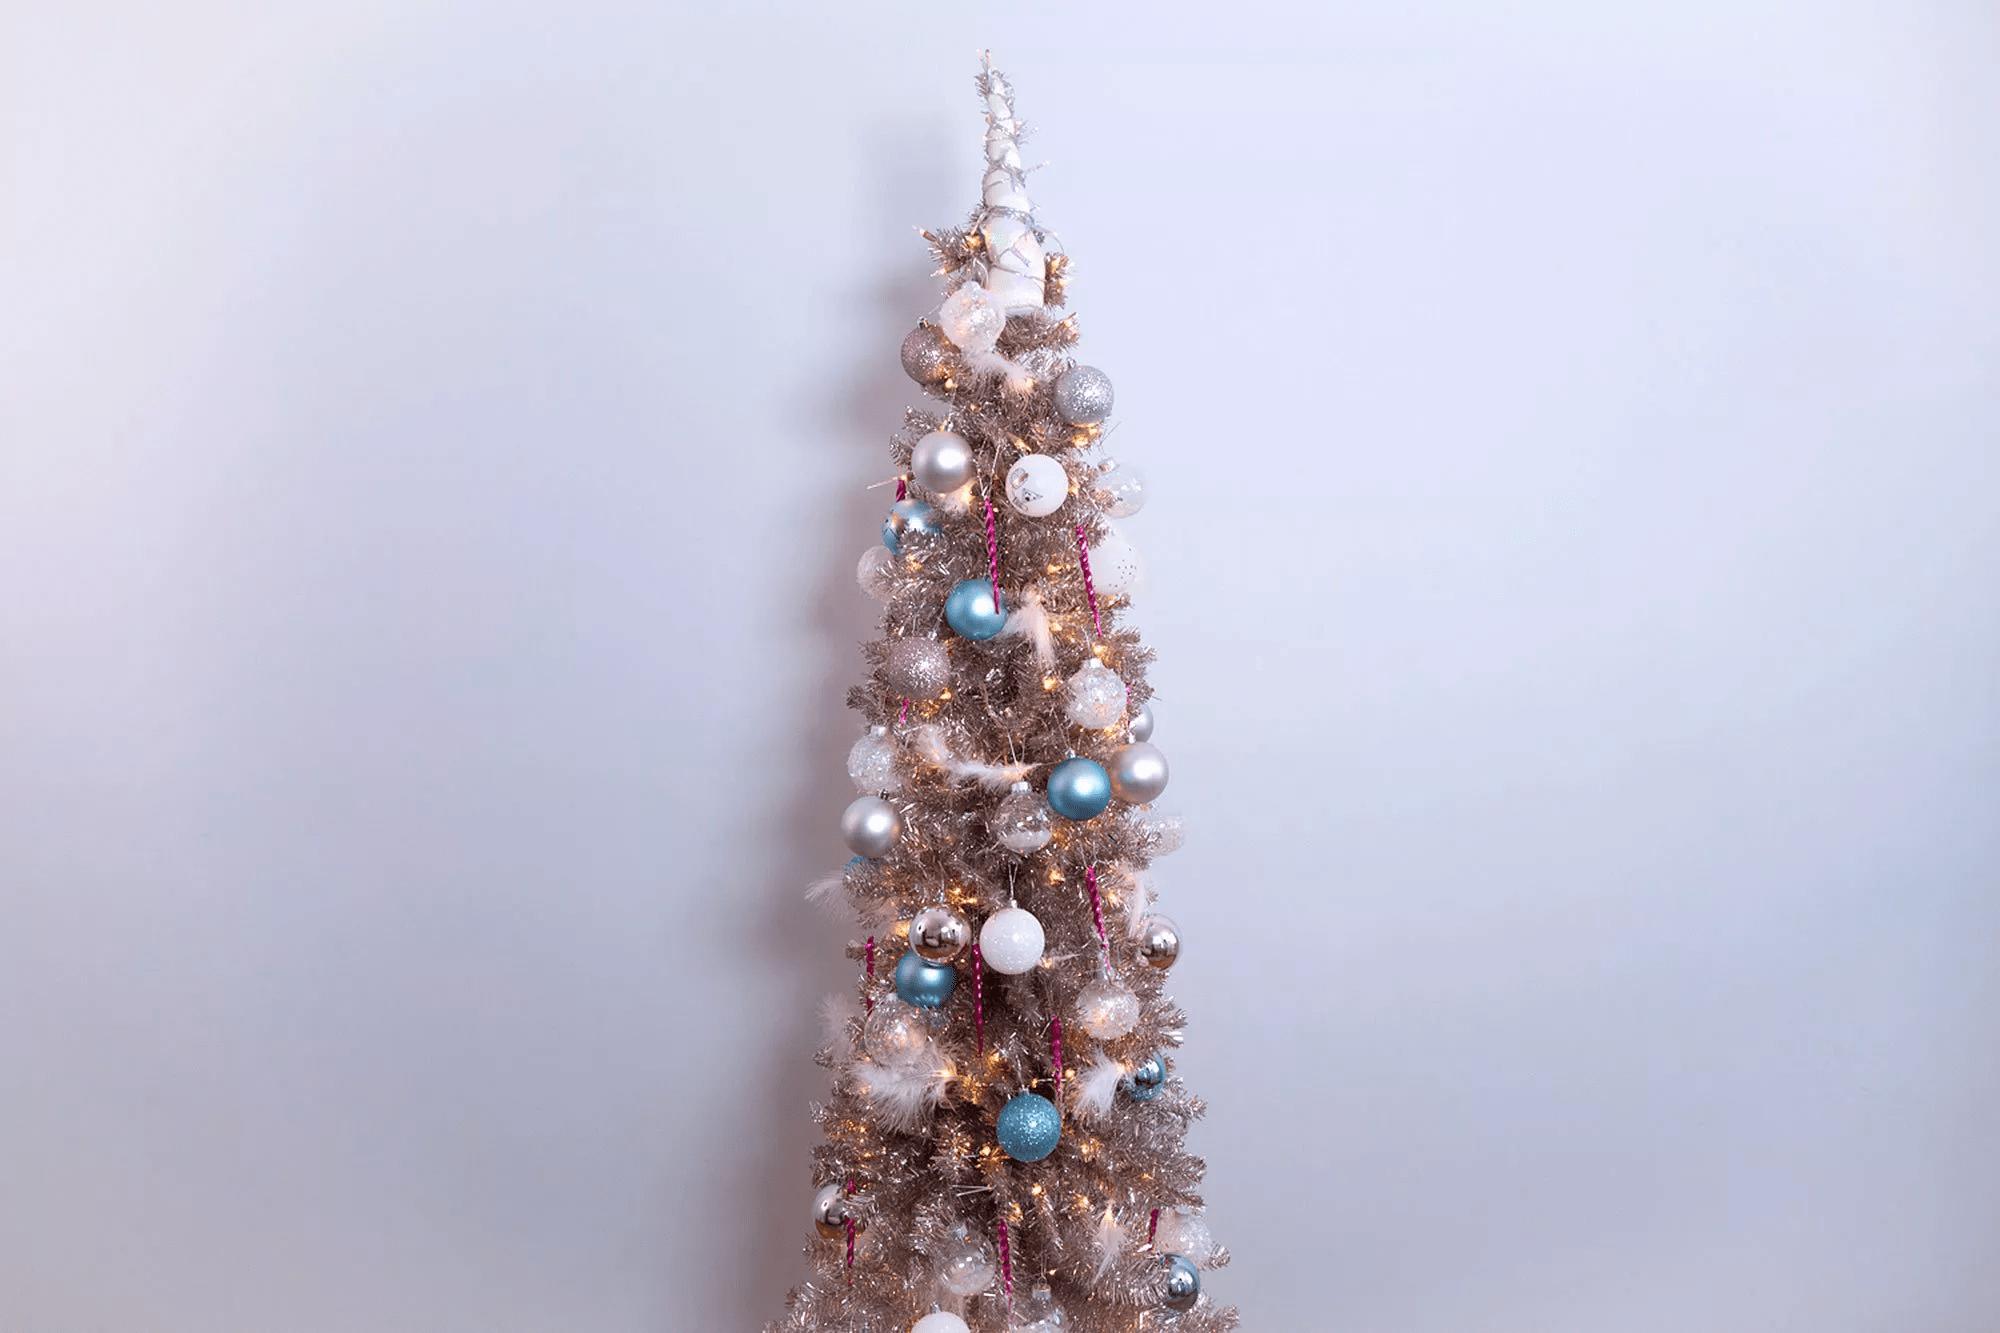 Arbre de Noël avec un sapin de licorne